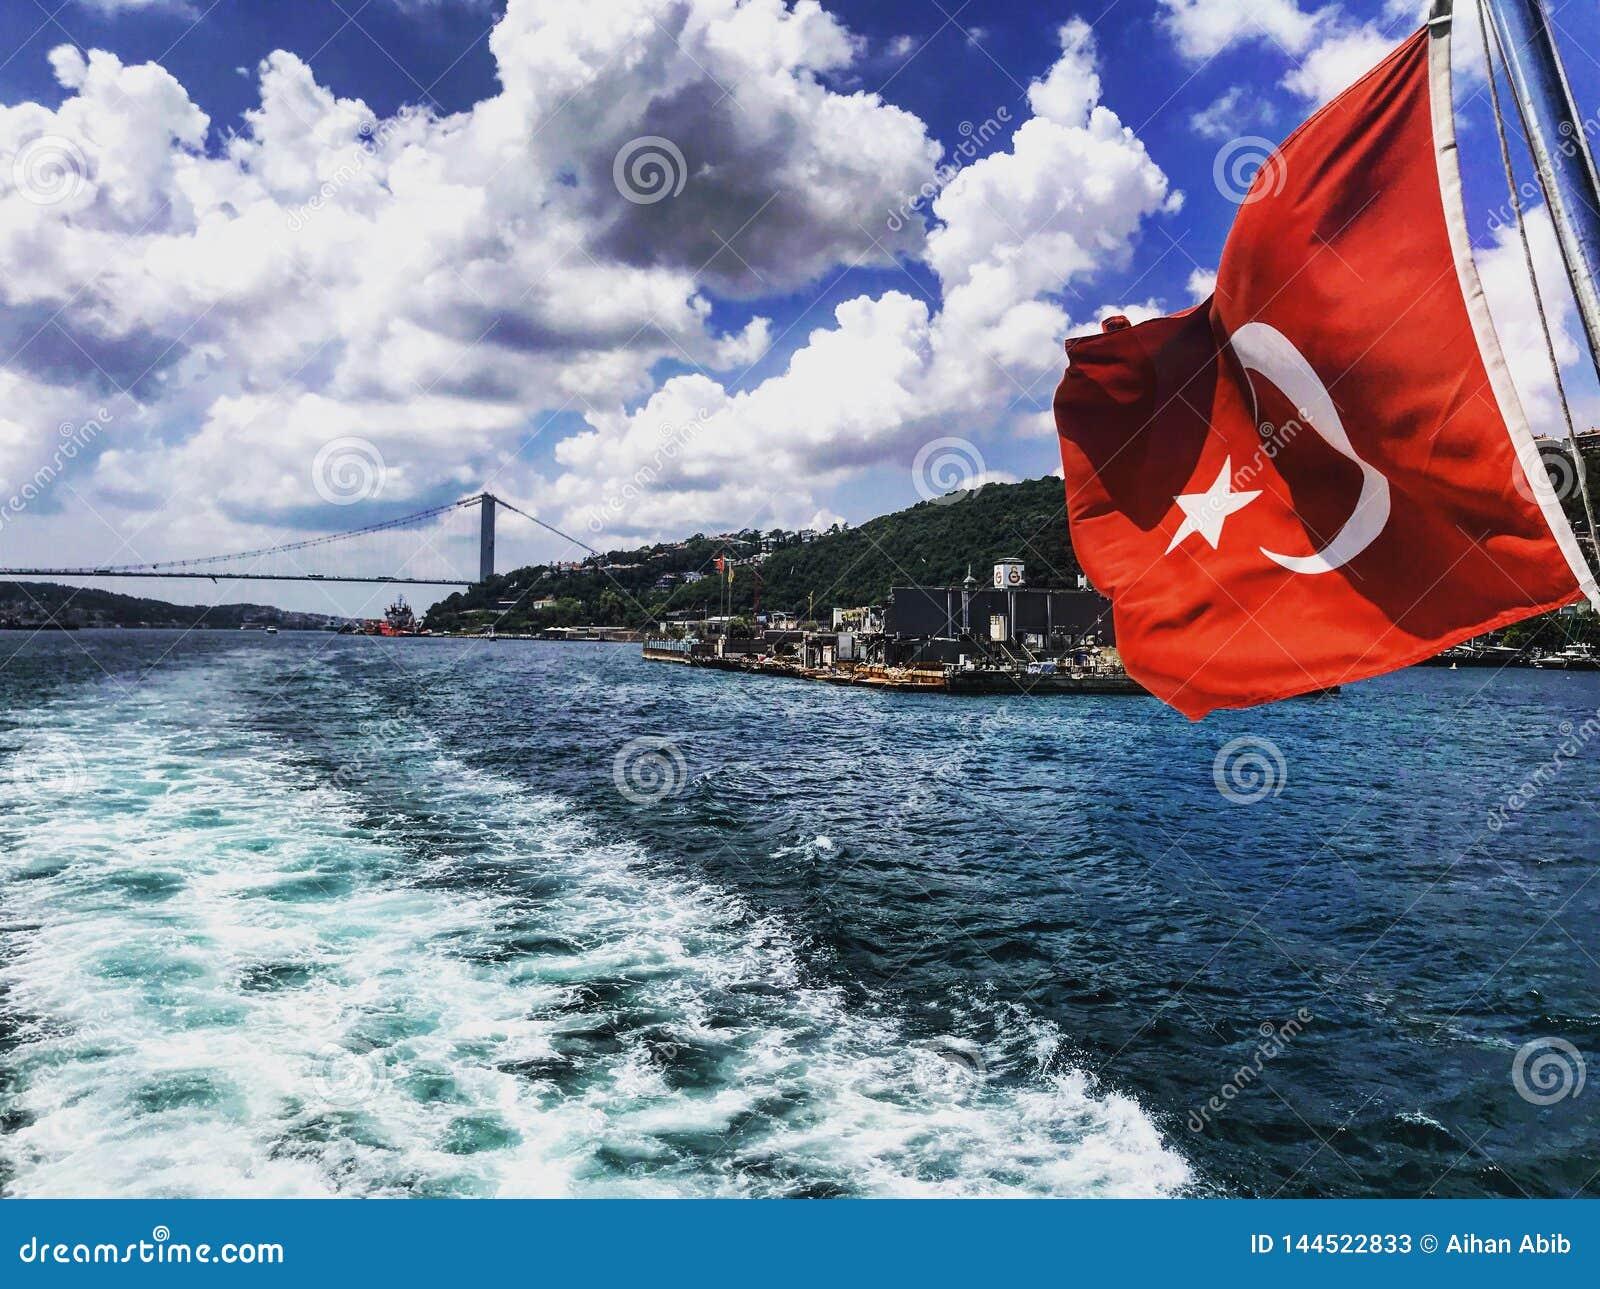 Bosphorus strait turkish flag turkey